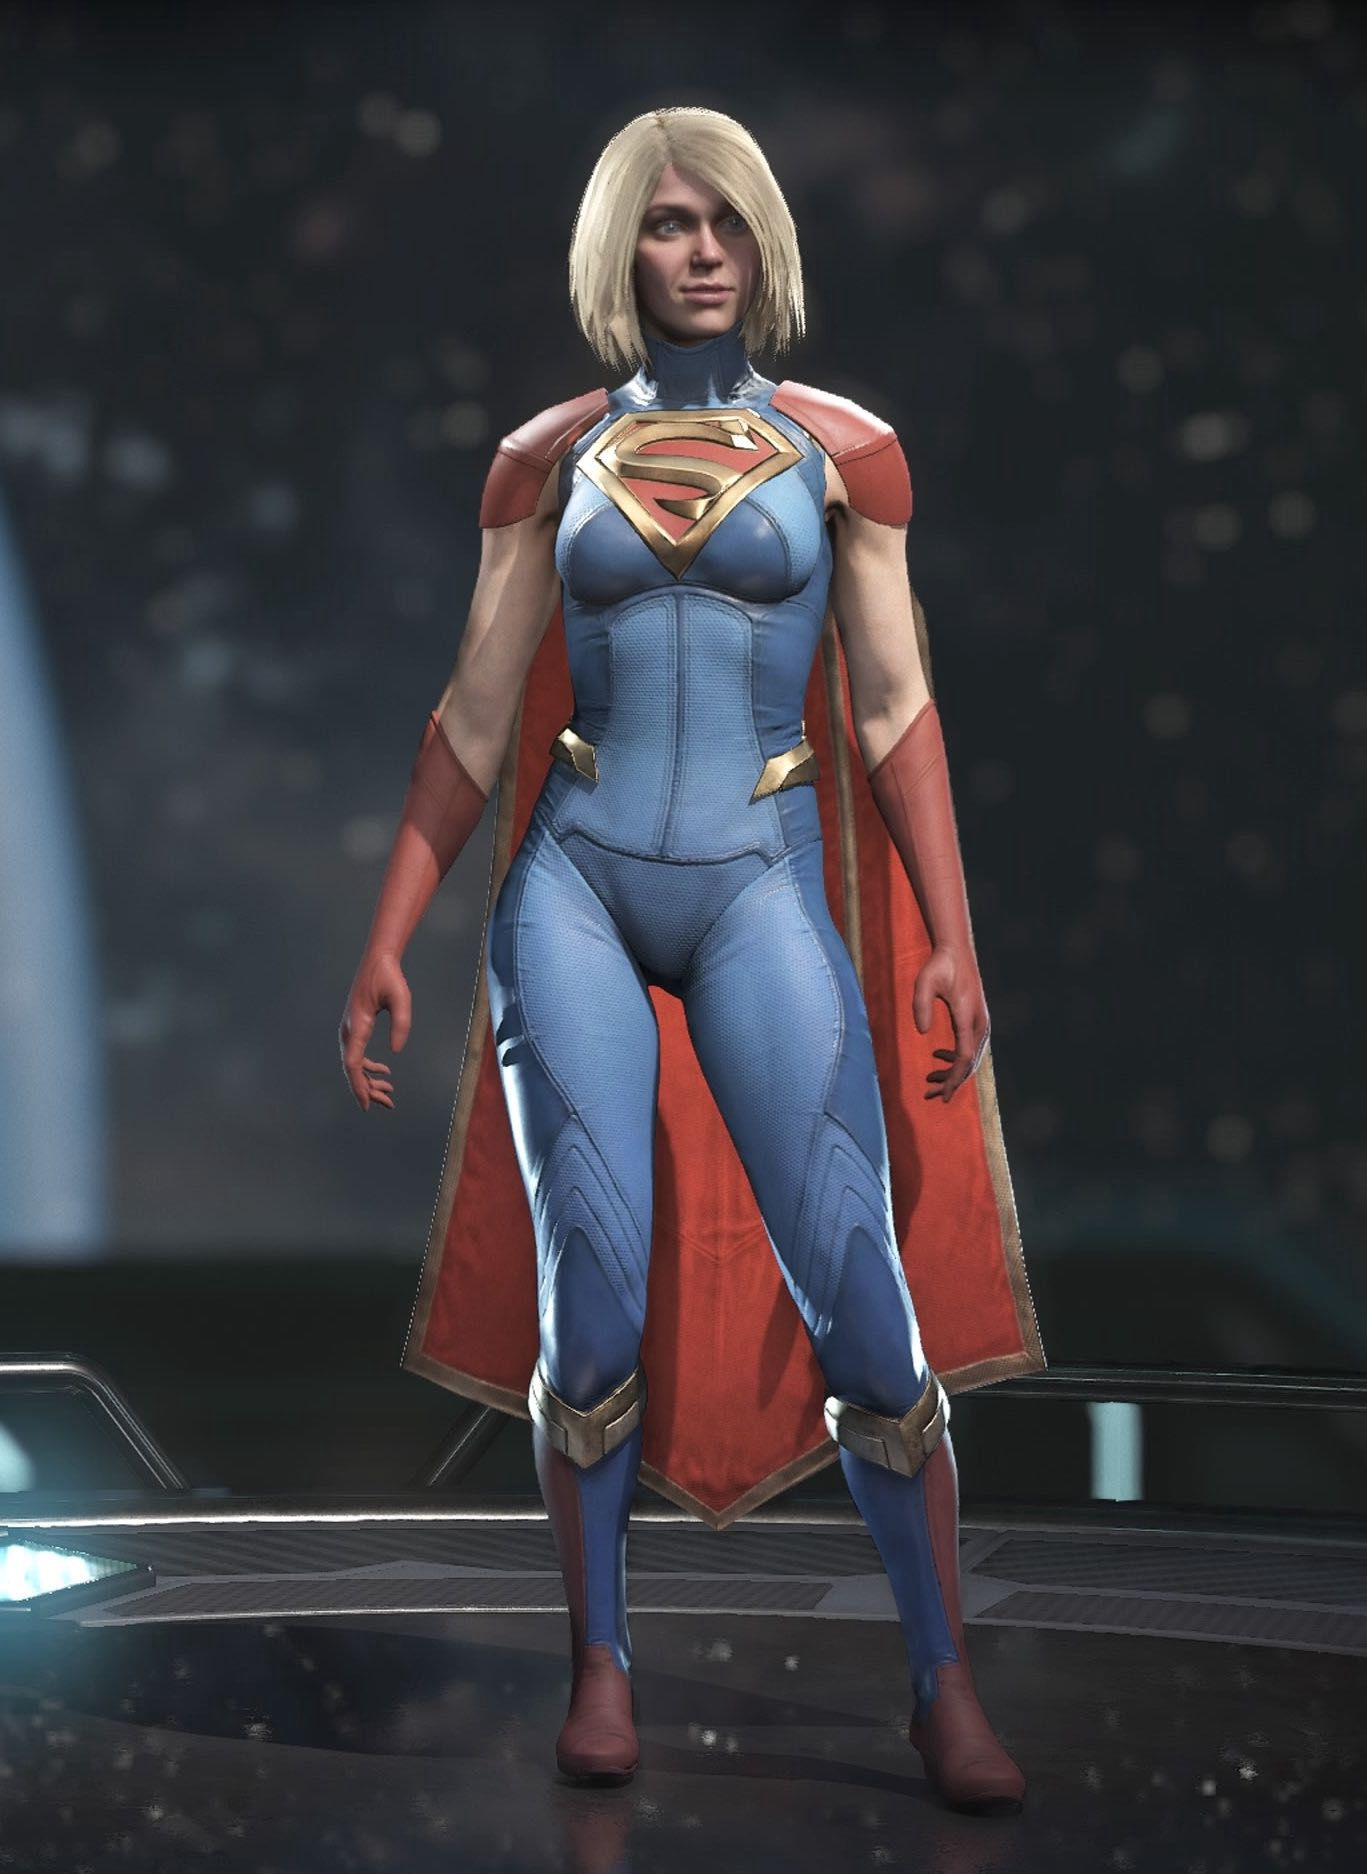 Supergirl Original Outfit on SupergirlDAFC - DeviantArt   Original Superwoman